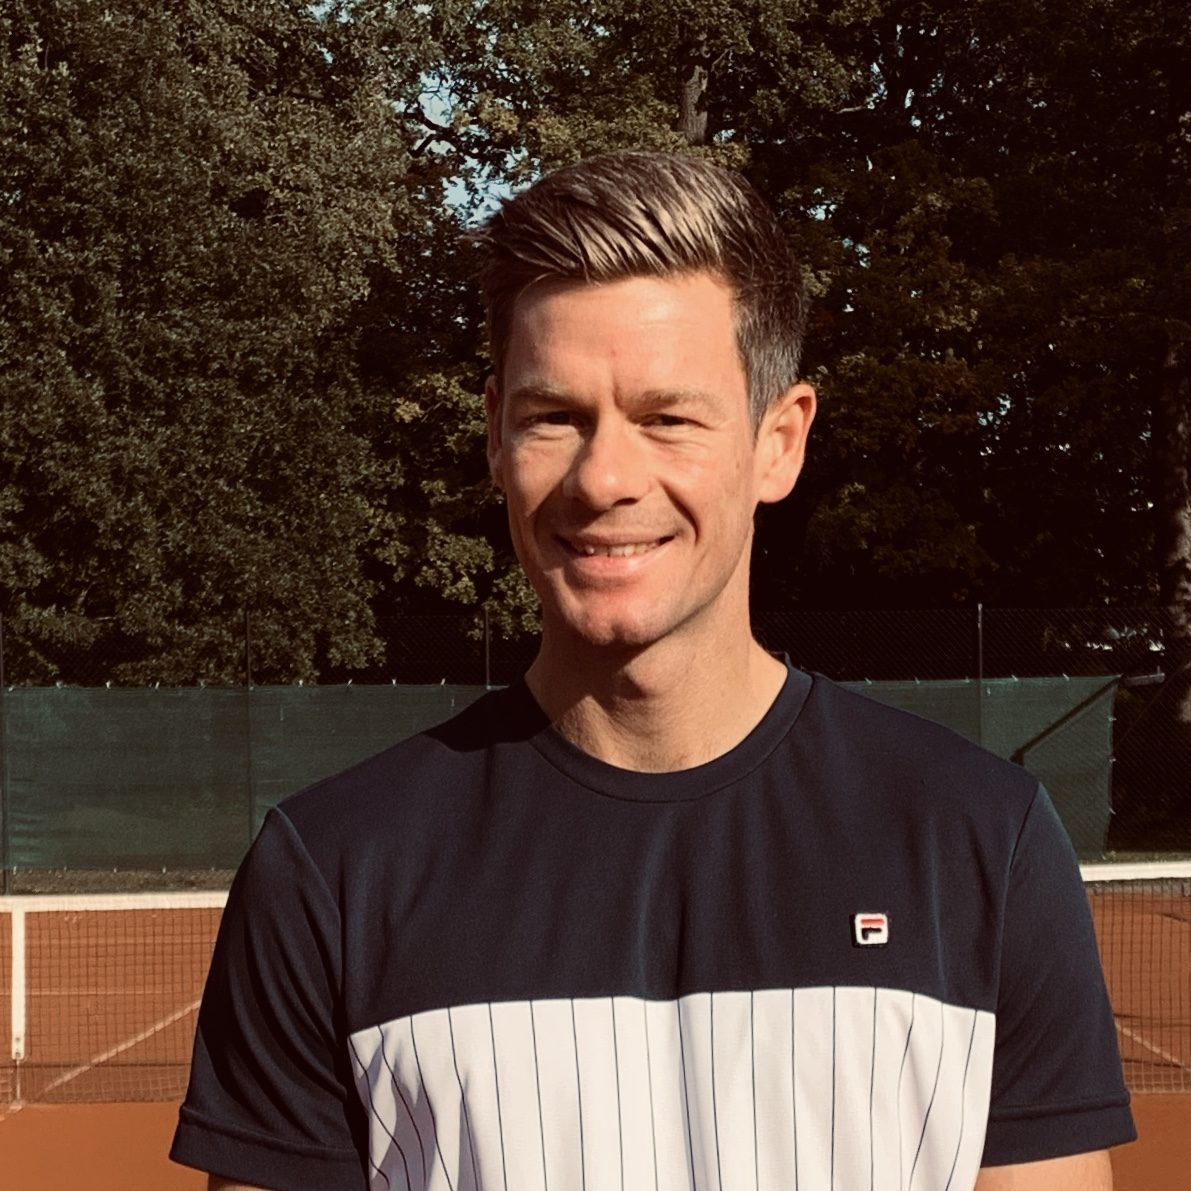 Philip Ørnø